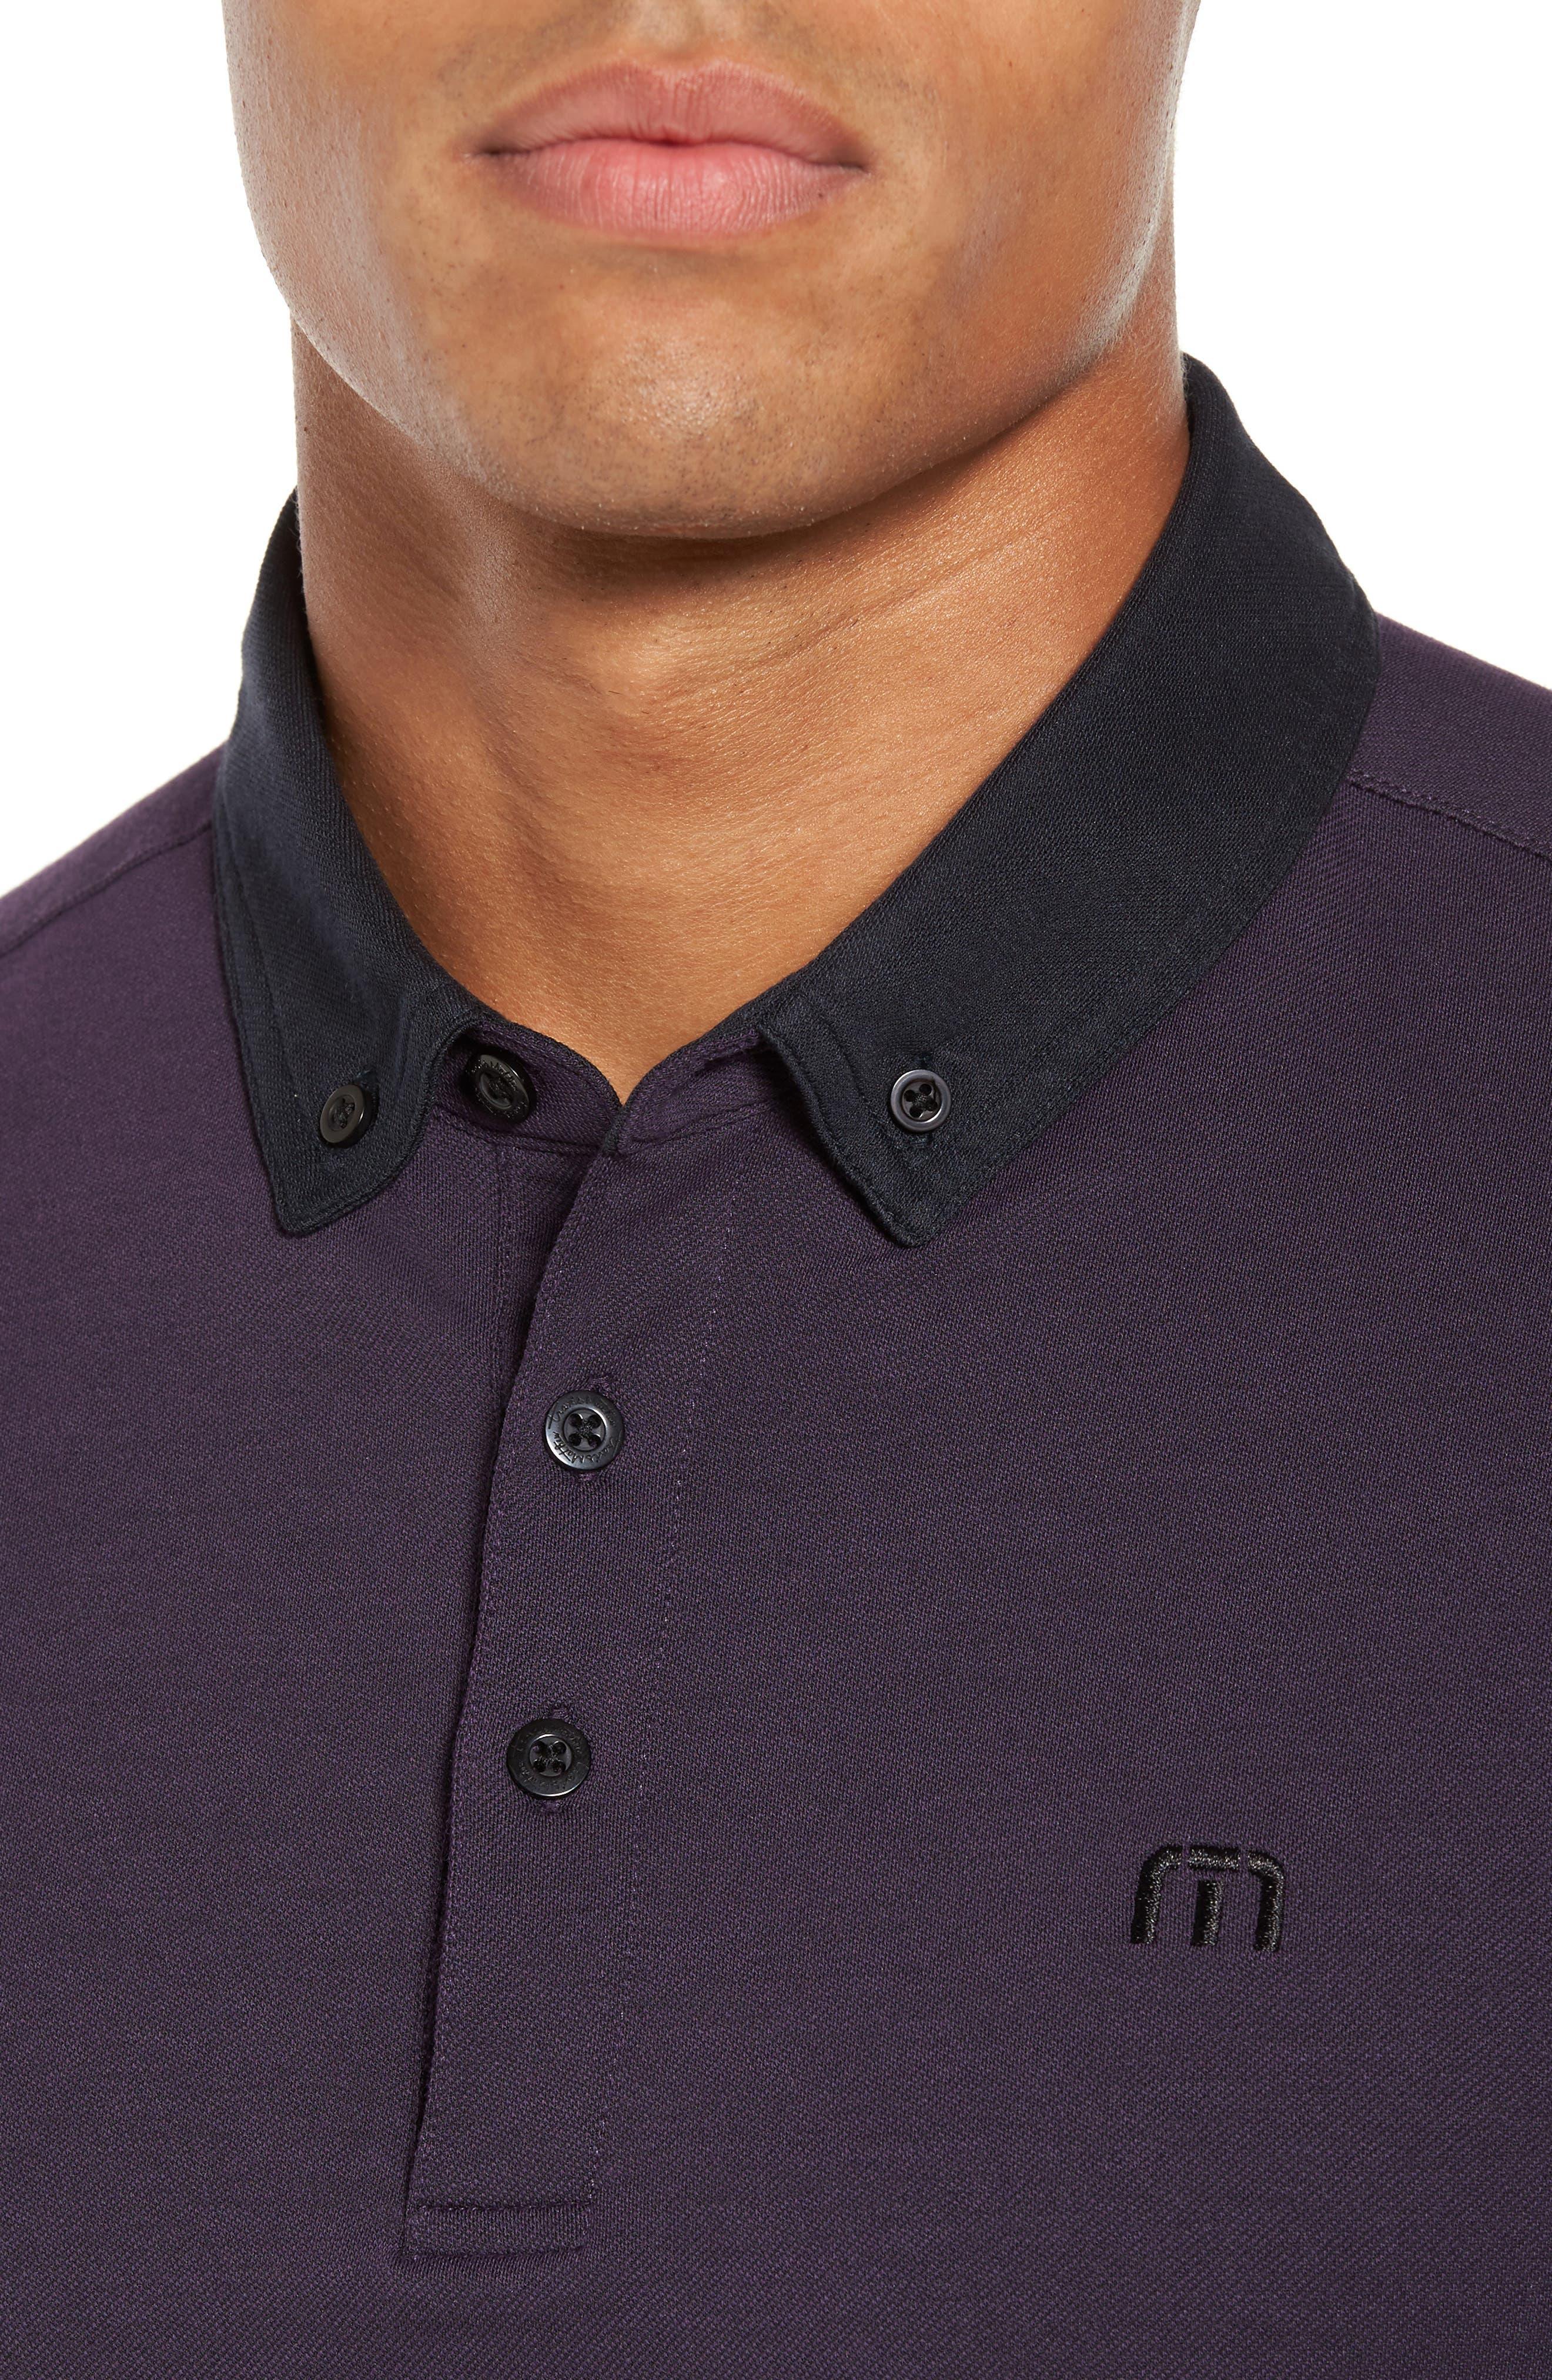 Irving Piqué Polo,                             Alternate thumbnail 4, color,                             Purple Plumeria/ Black